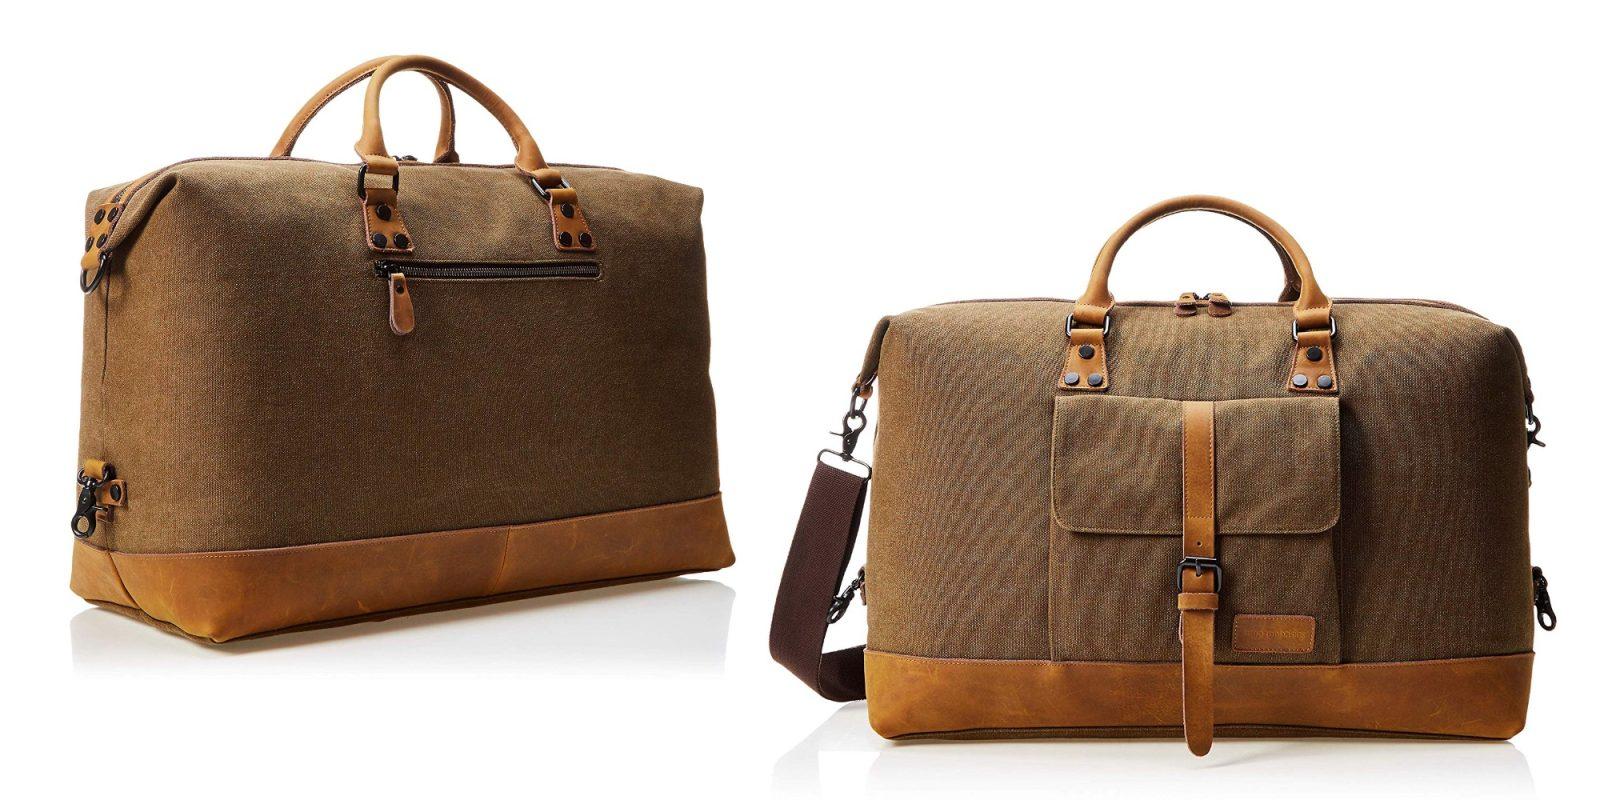 AmazonBasics' Canvas Duffel Bag totes around your travel essentials at $34 (Reg. $50)